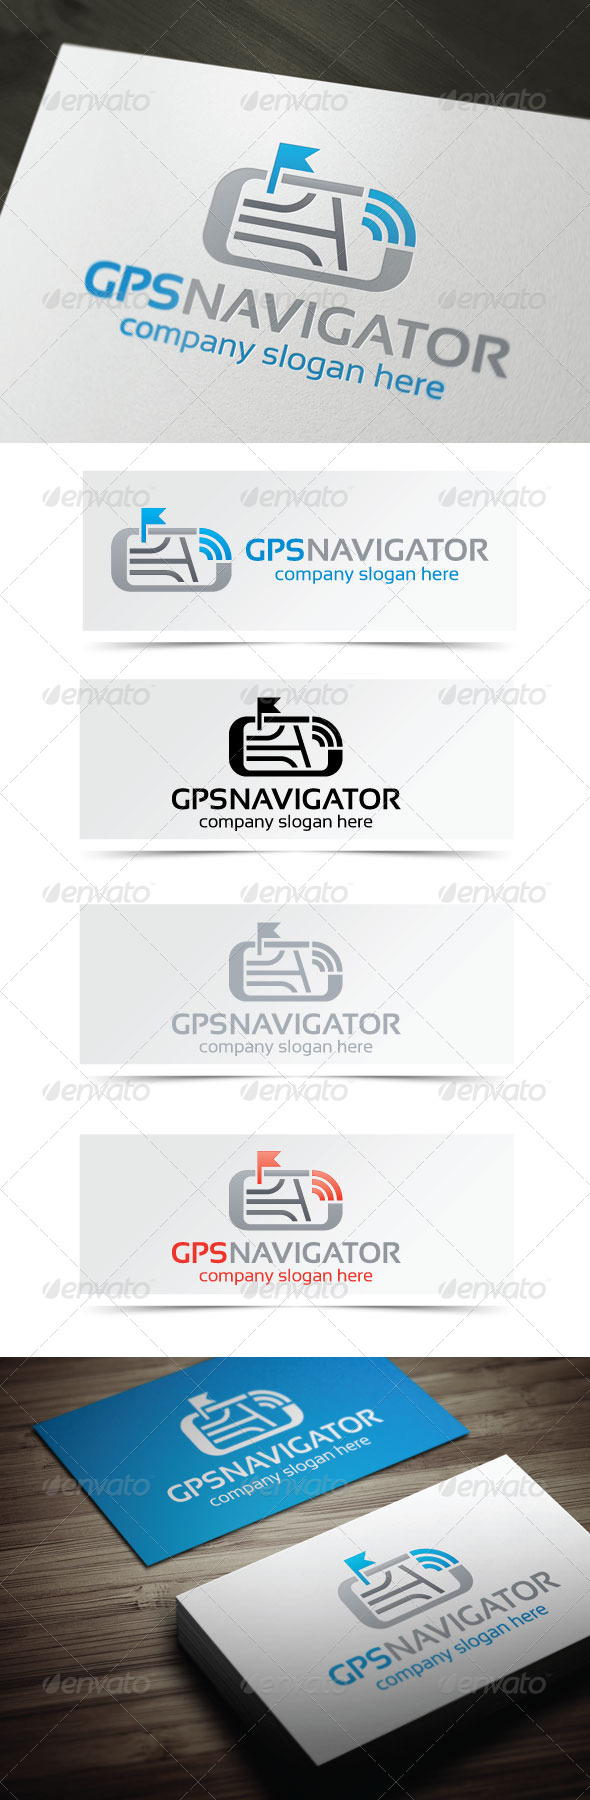 GraphicRiver GPS Navigator 4411501